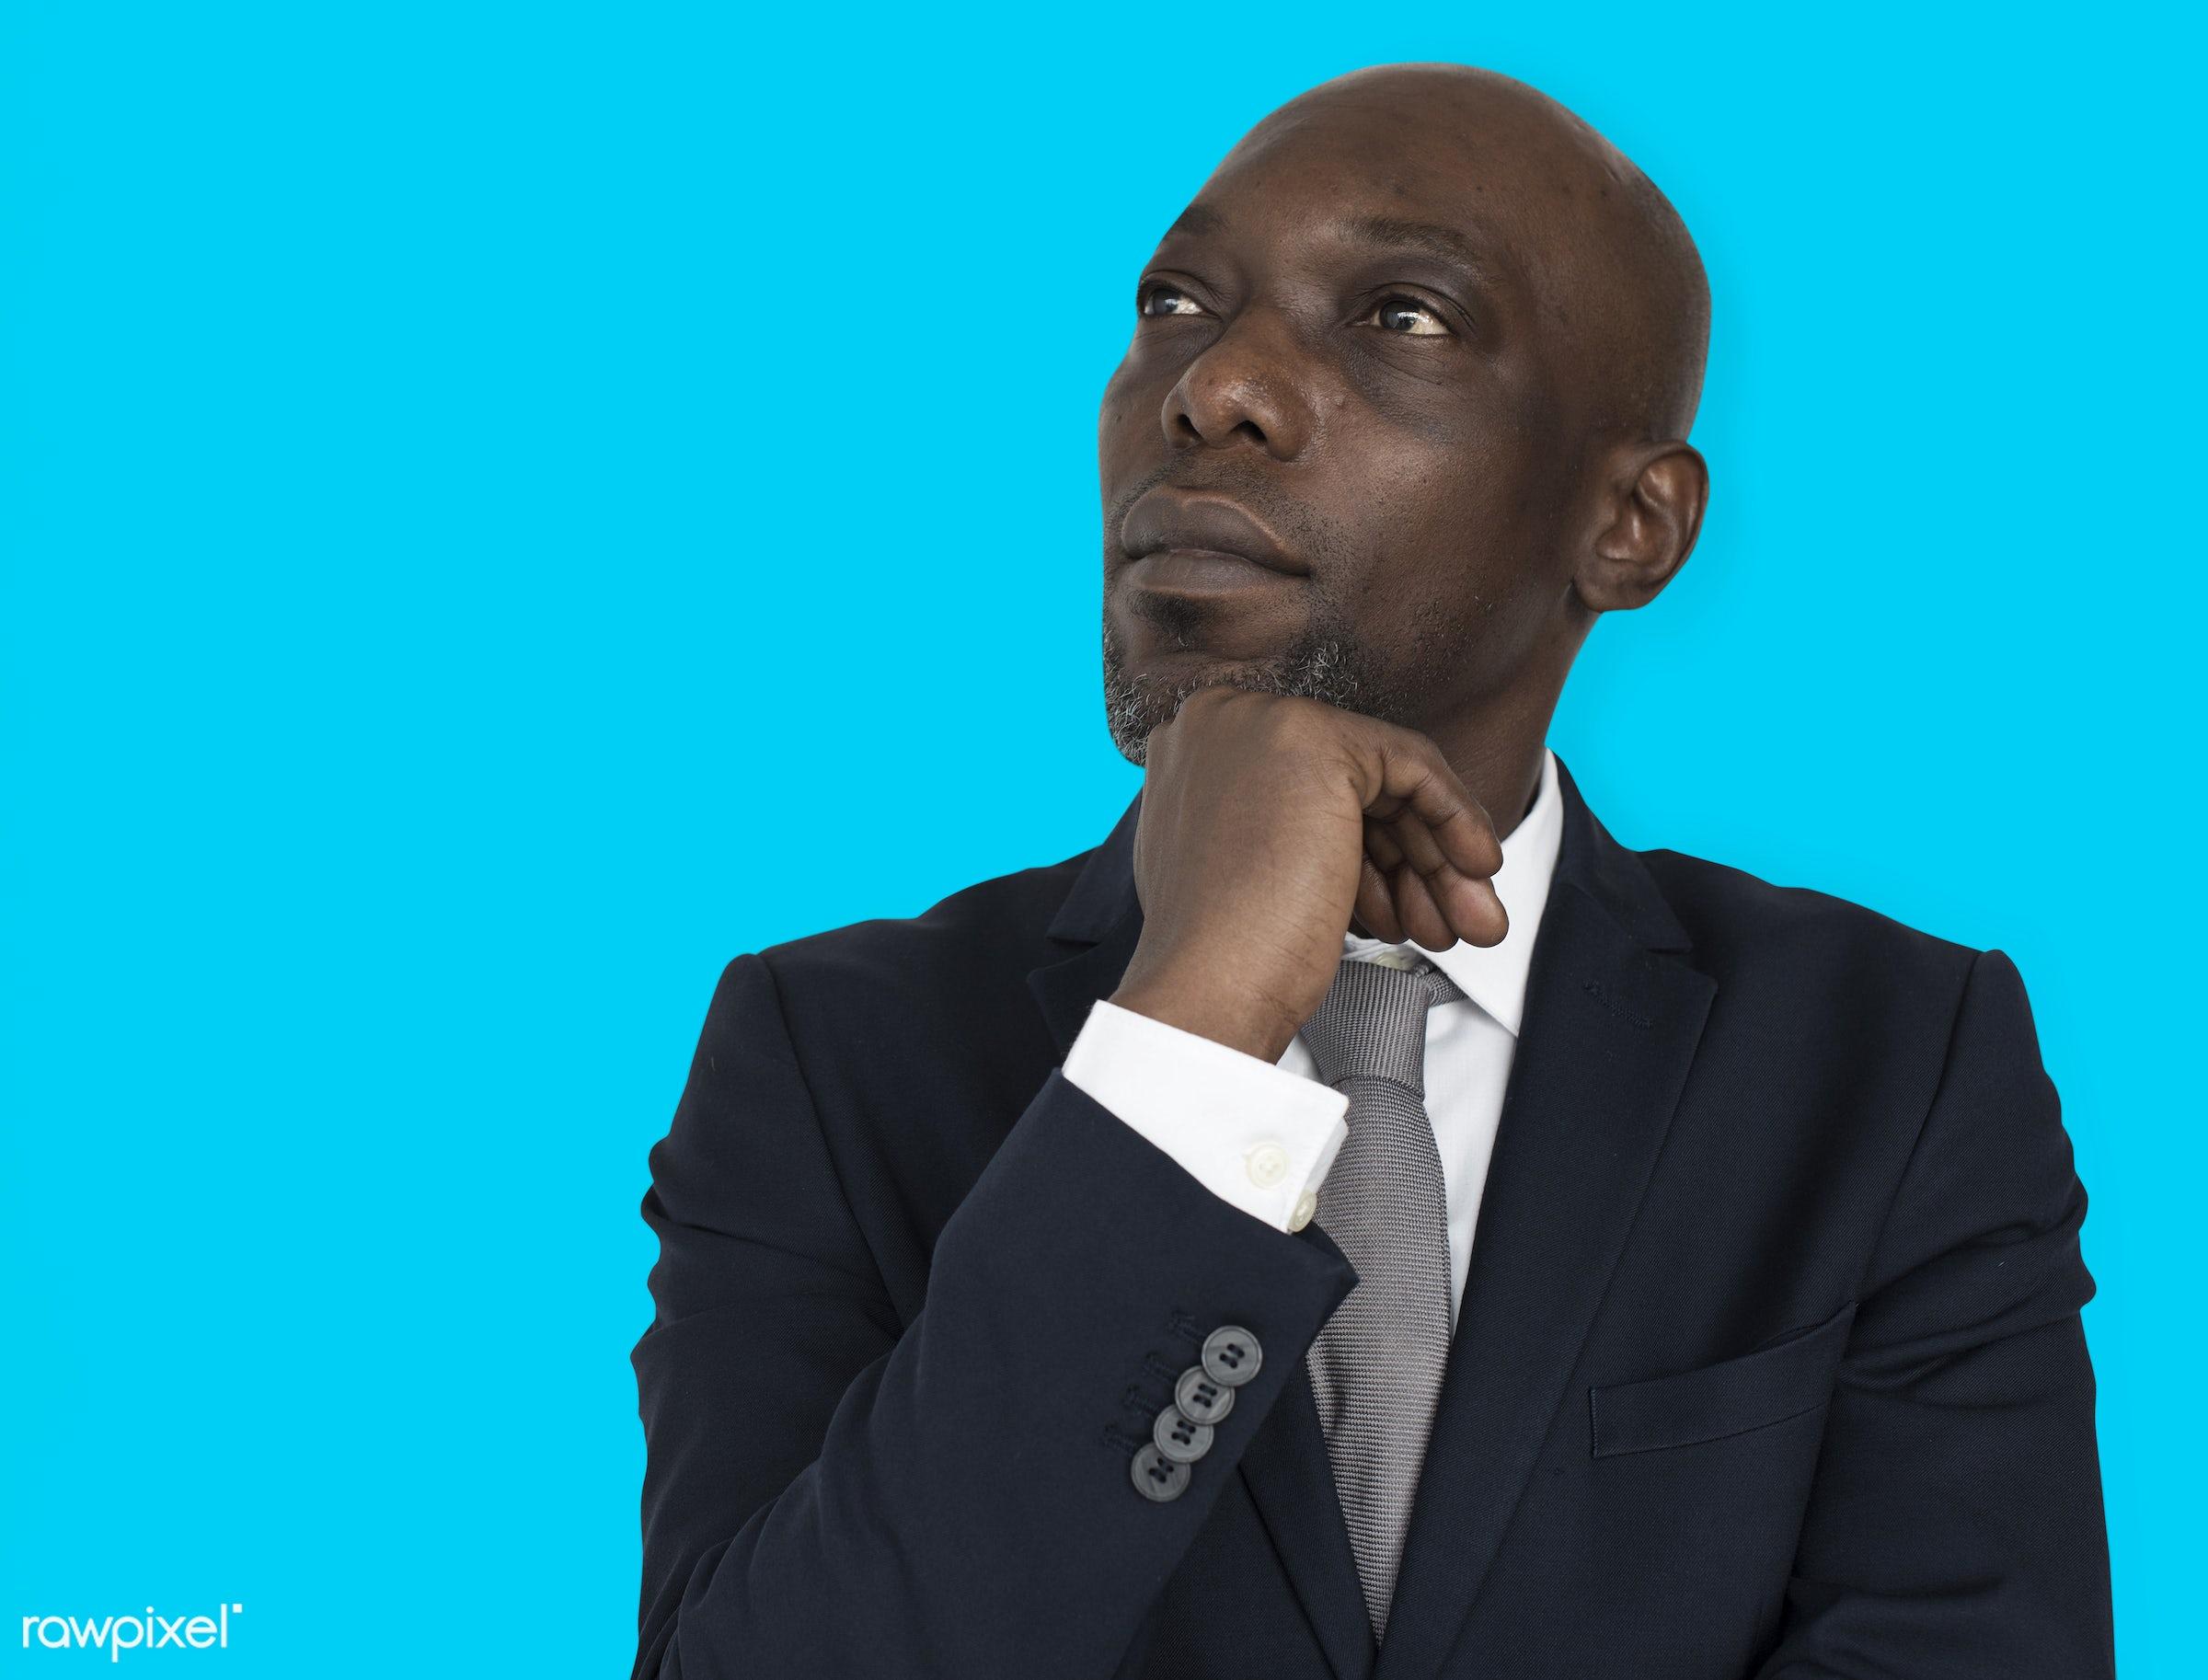 black, african american, african, man, male, business, suit, tie, professional, portrait